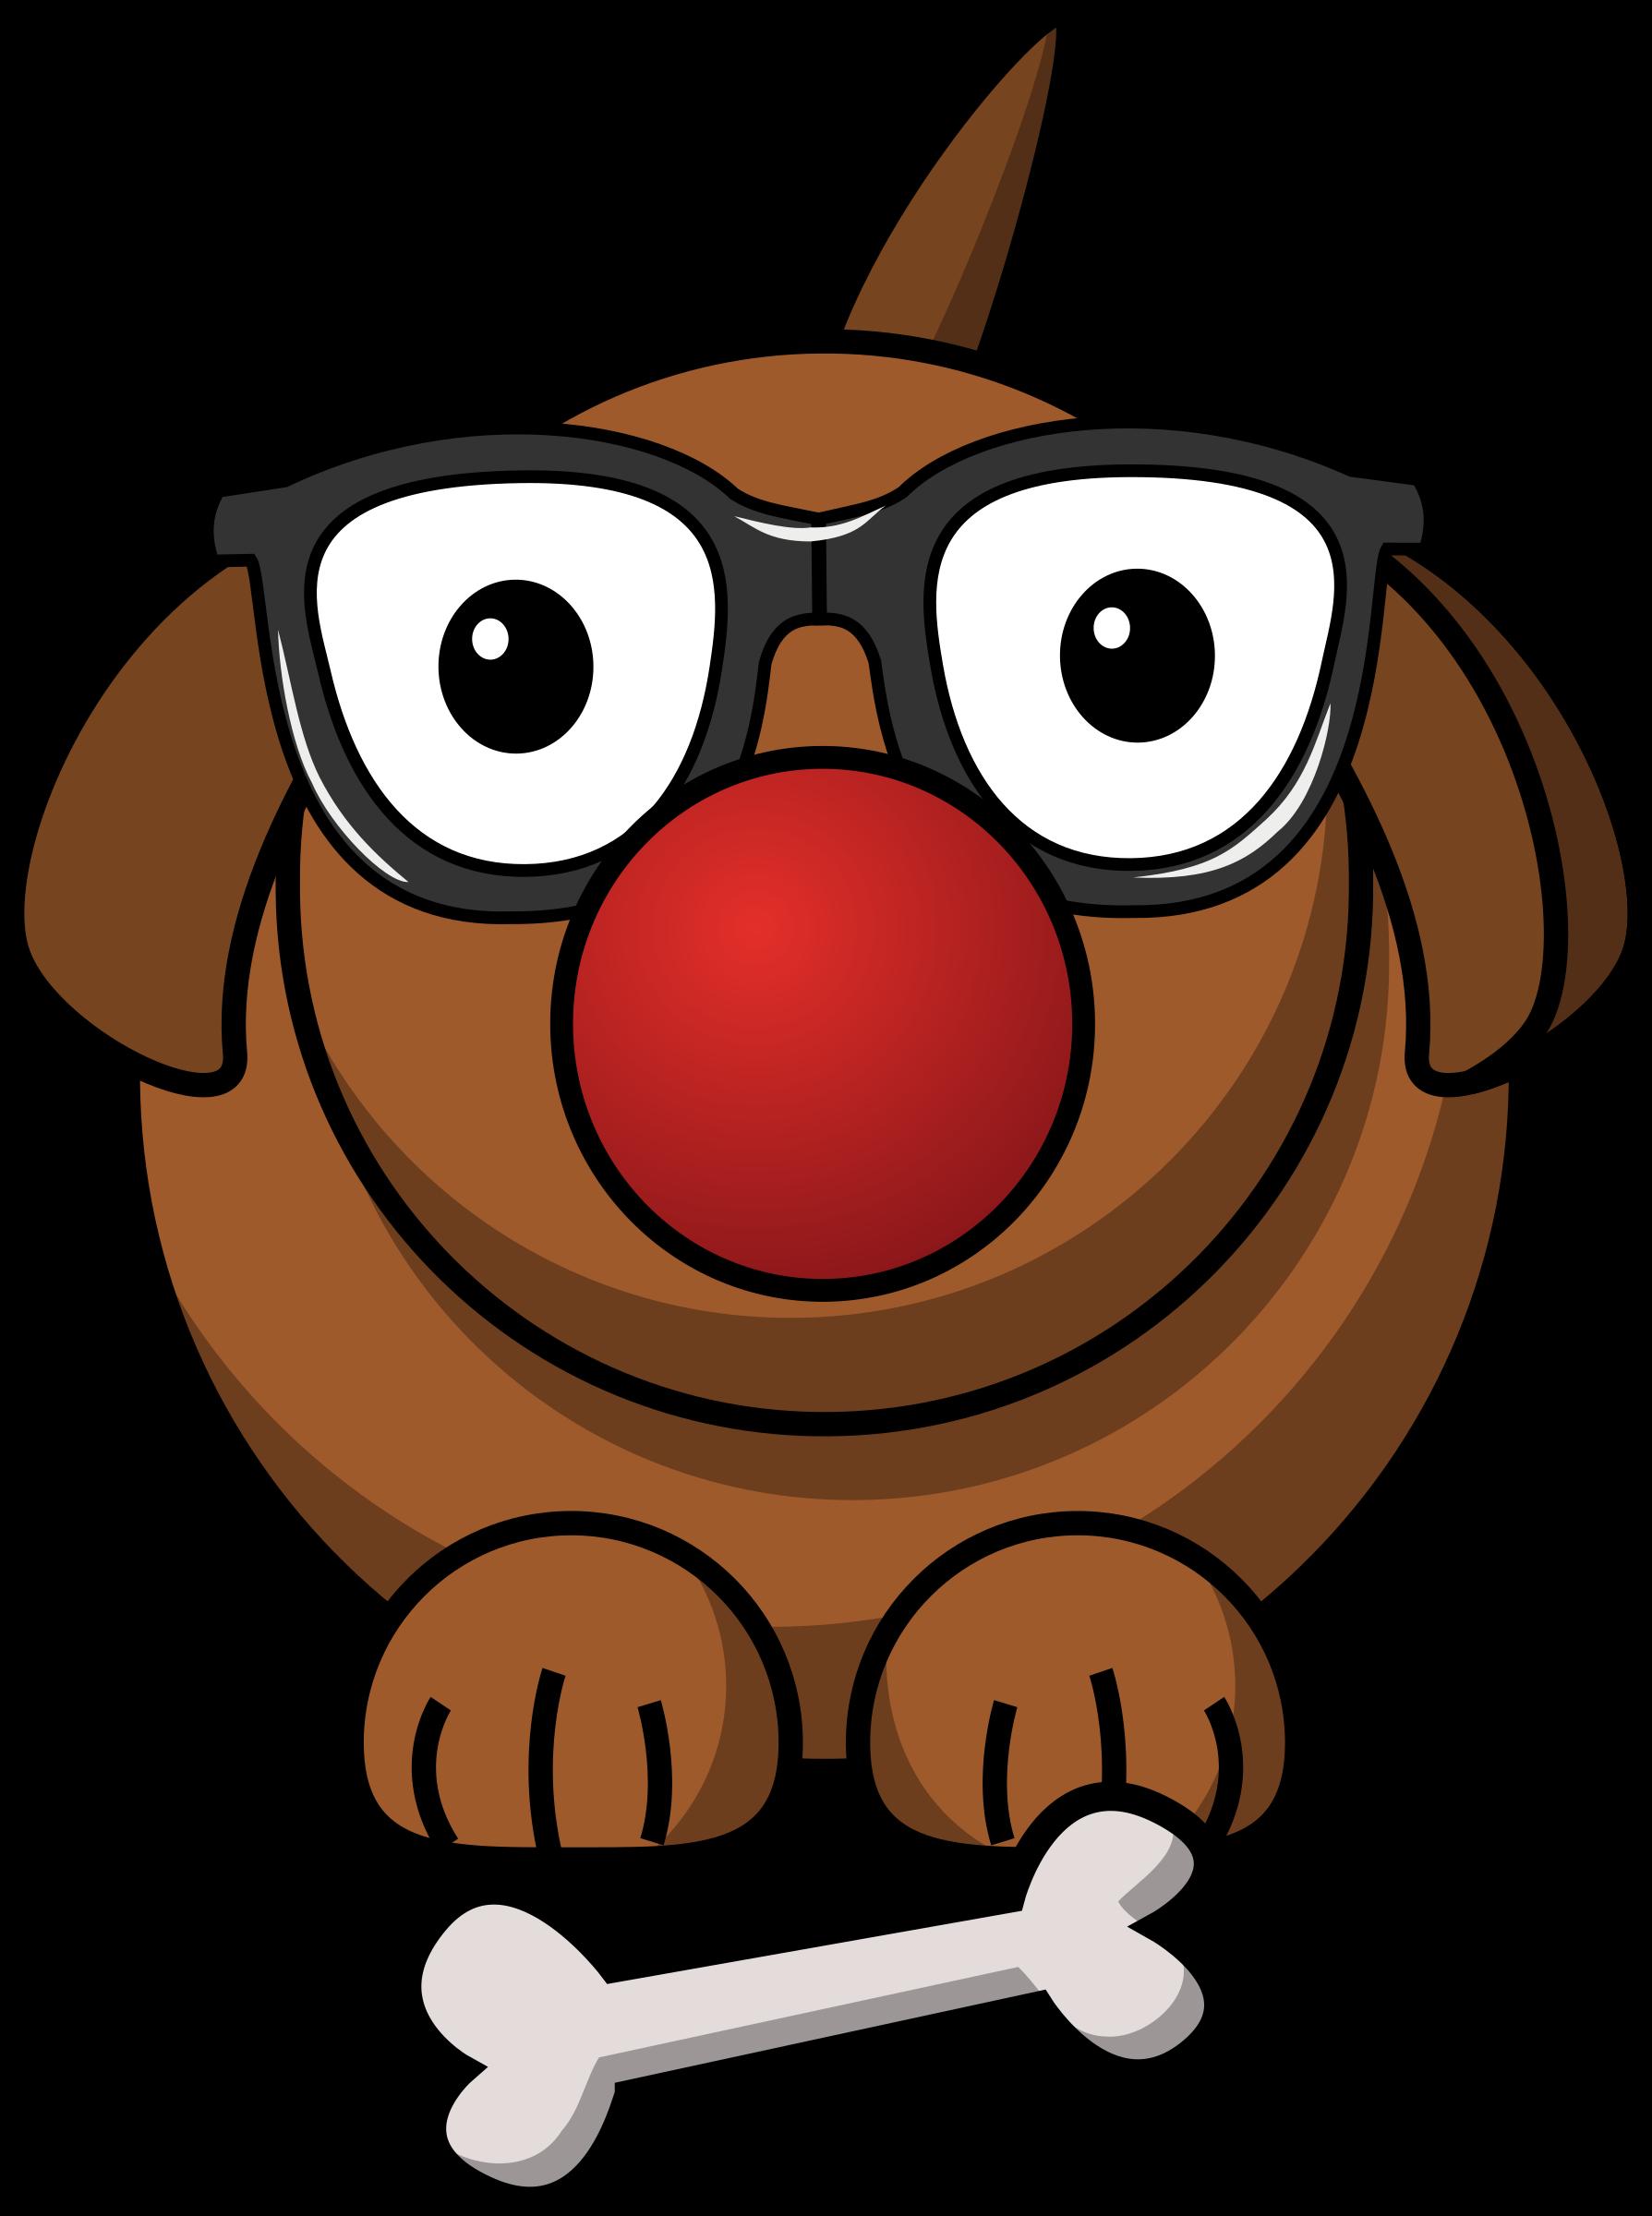 Clipart - clowny dog (1789 x 2400 Pixel)